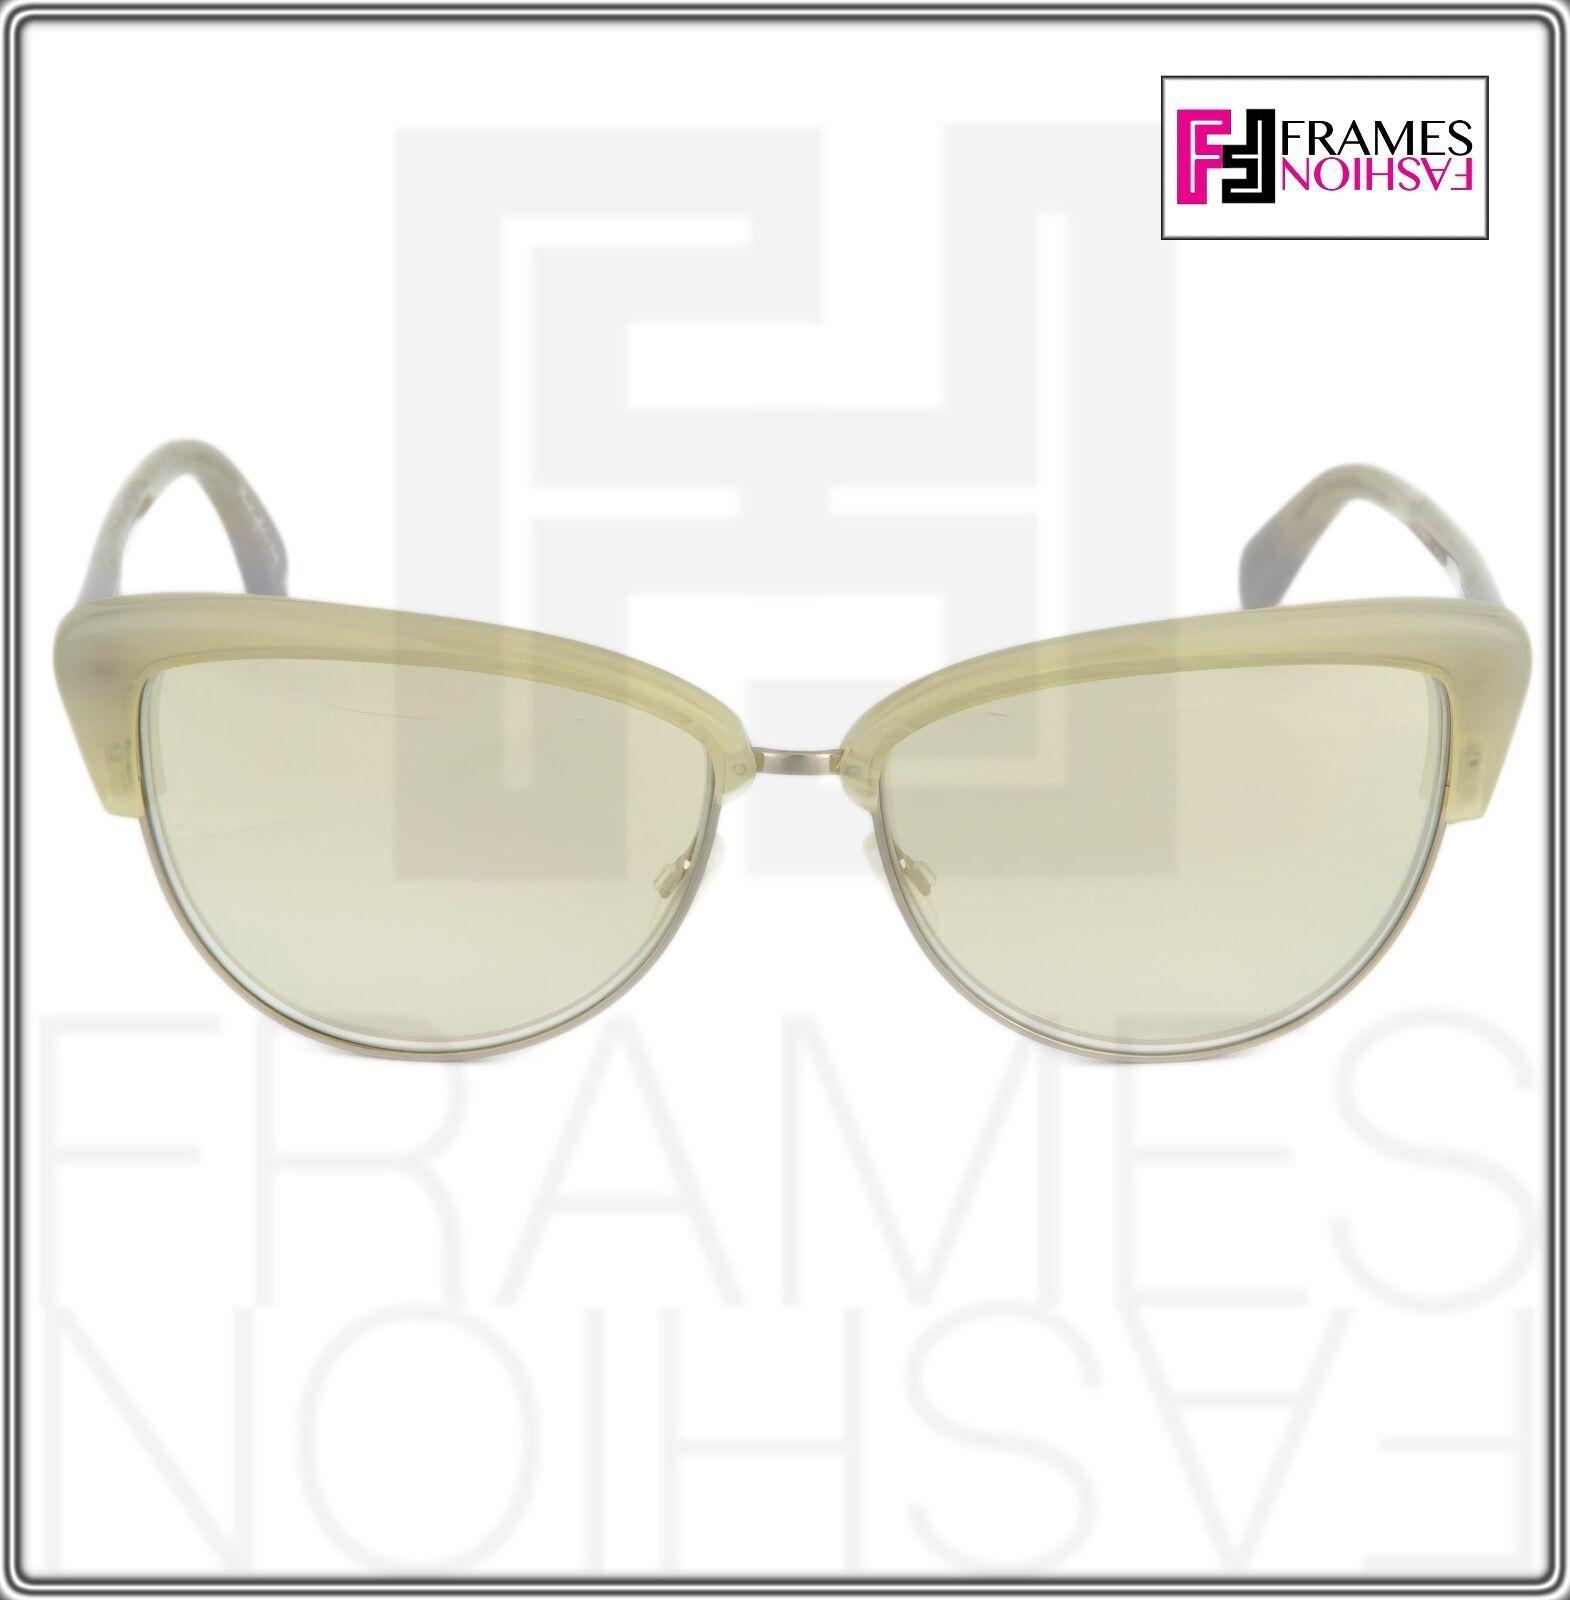 OLIVER PEOPLES ALISHA OV5244S White Pearl Flash Mirrored Sunglasses 5244 Women image 8